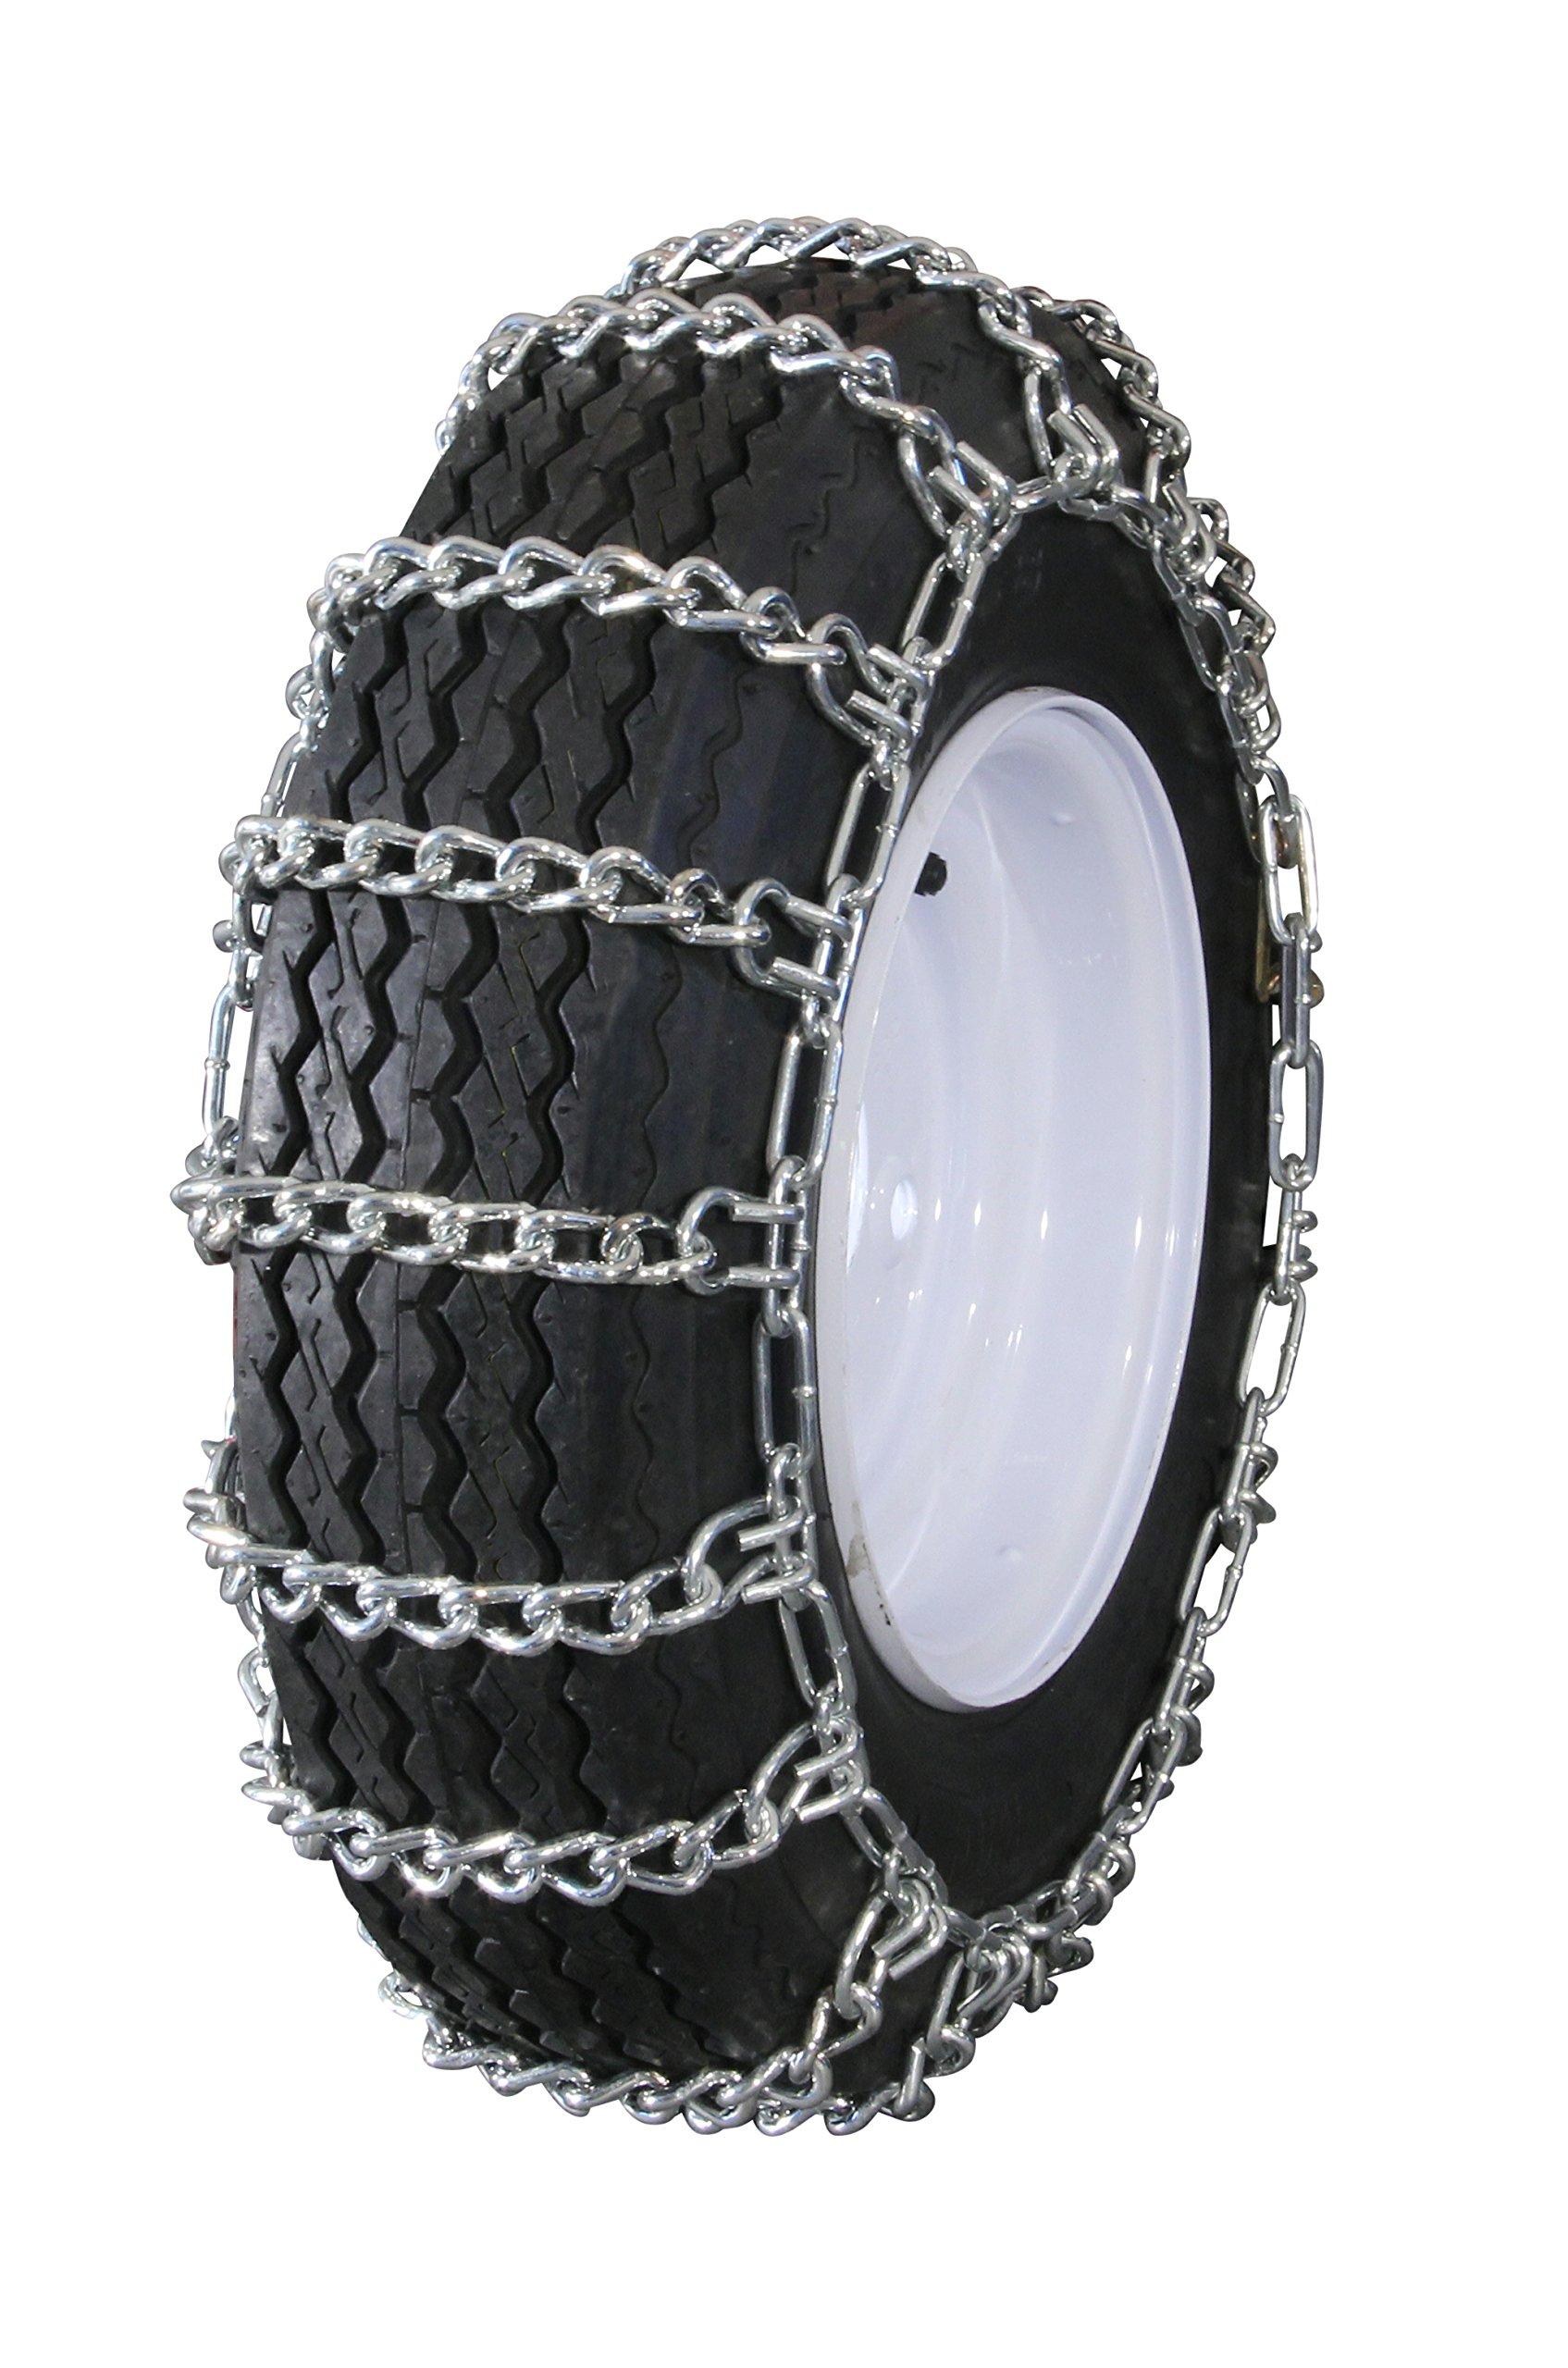 MaxTrac Peerless MTL-423 Garden Tractor 2 Link Ladder Style Tire Chains 4.10/3.50x4, 3.40/3.00x5, 4.10x4, 3.50x4, 3.40x5, 3.00x5 by MaxTrac